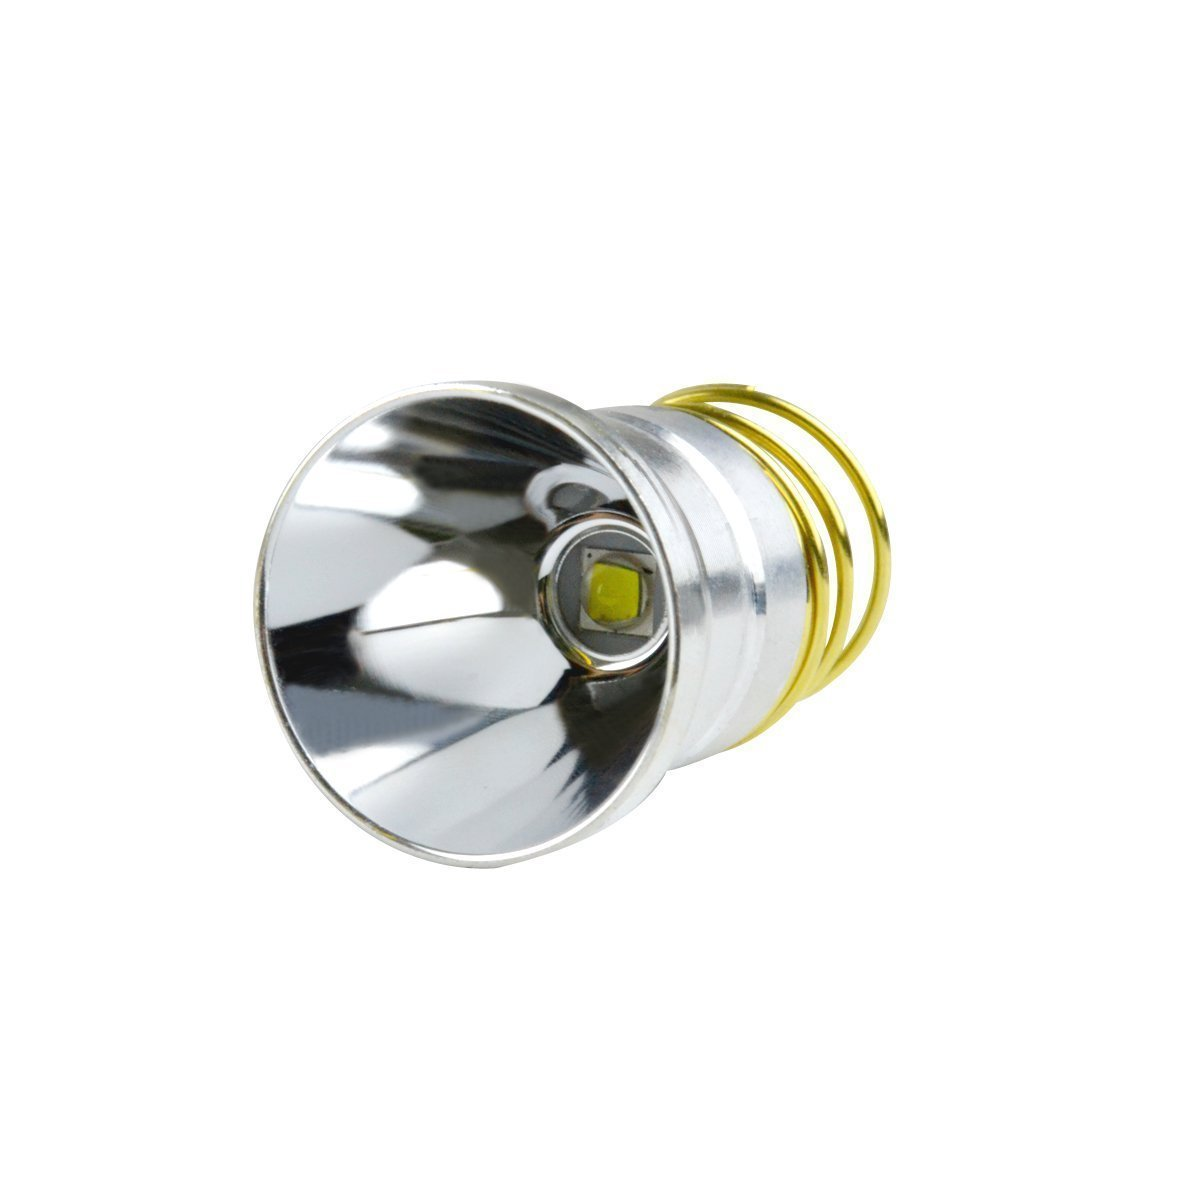 BESTSUN Ultra Bright New Cree XM-L2 LED Bulb 1 Mode 1200Lumens Drop-in P60 Design Module Flashlight Repair Parts Torch Replacement Bulb for Surefire Hugsby C2 G2 Z2 6P 9P G3 S3 D2 Ultrafire 501B 502B